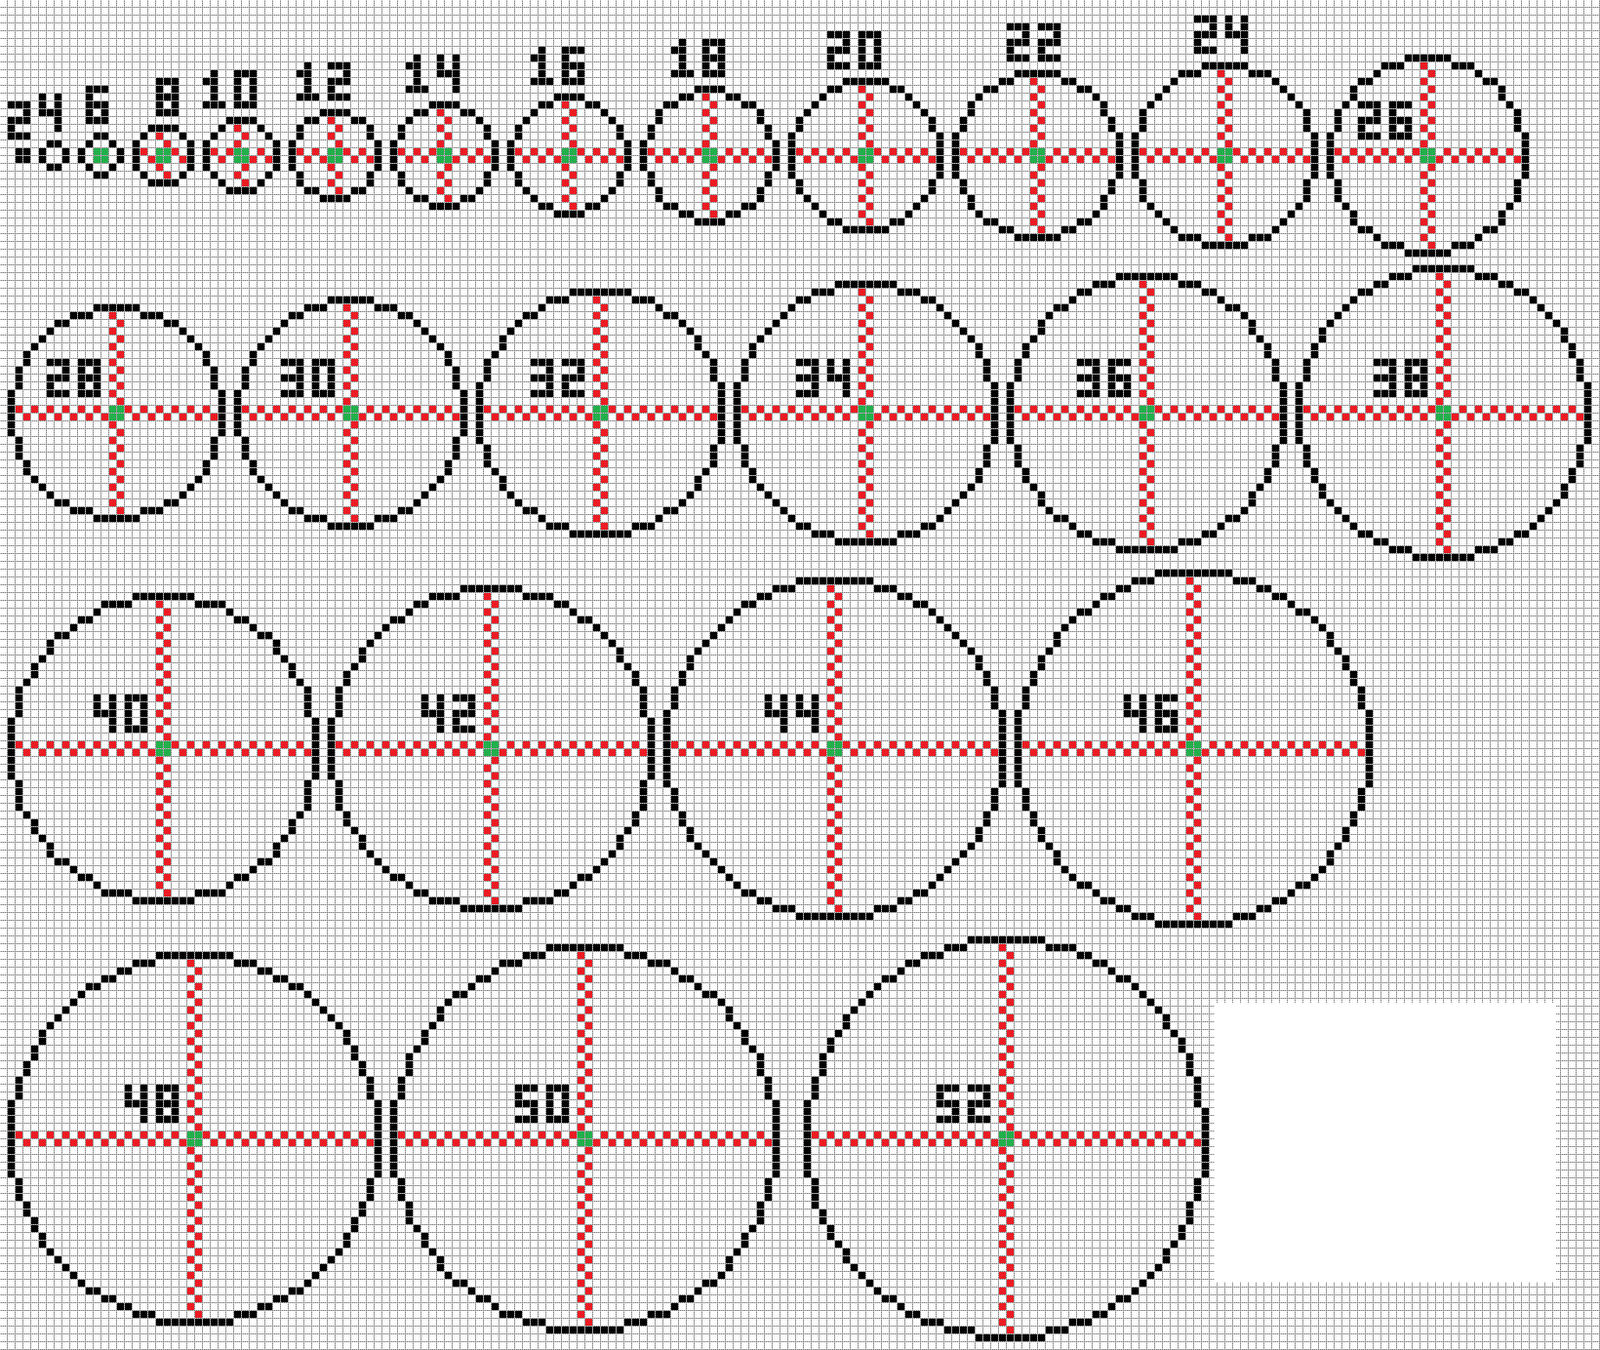 Minecraft Circle Diagram Ethernet Plug Wiring Help Mcx360 Discussion Xbox 360 Edition Forum